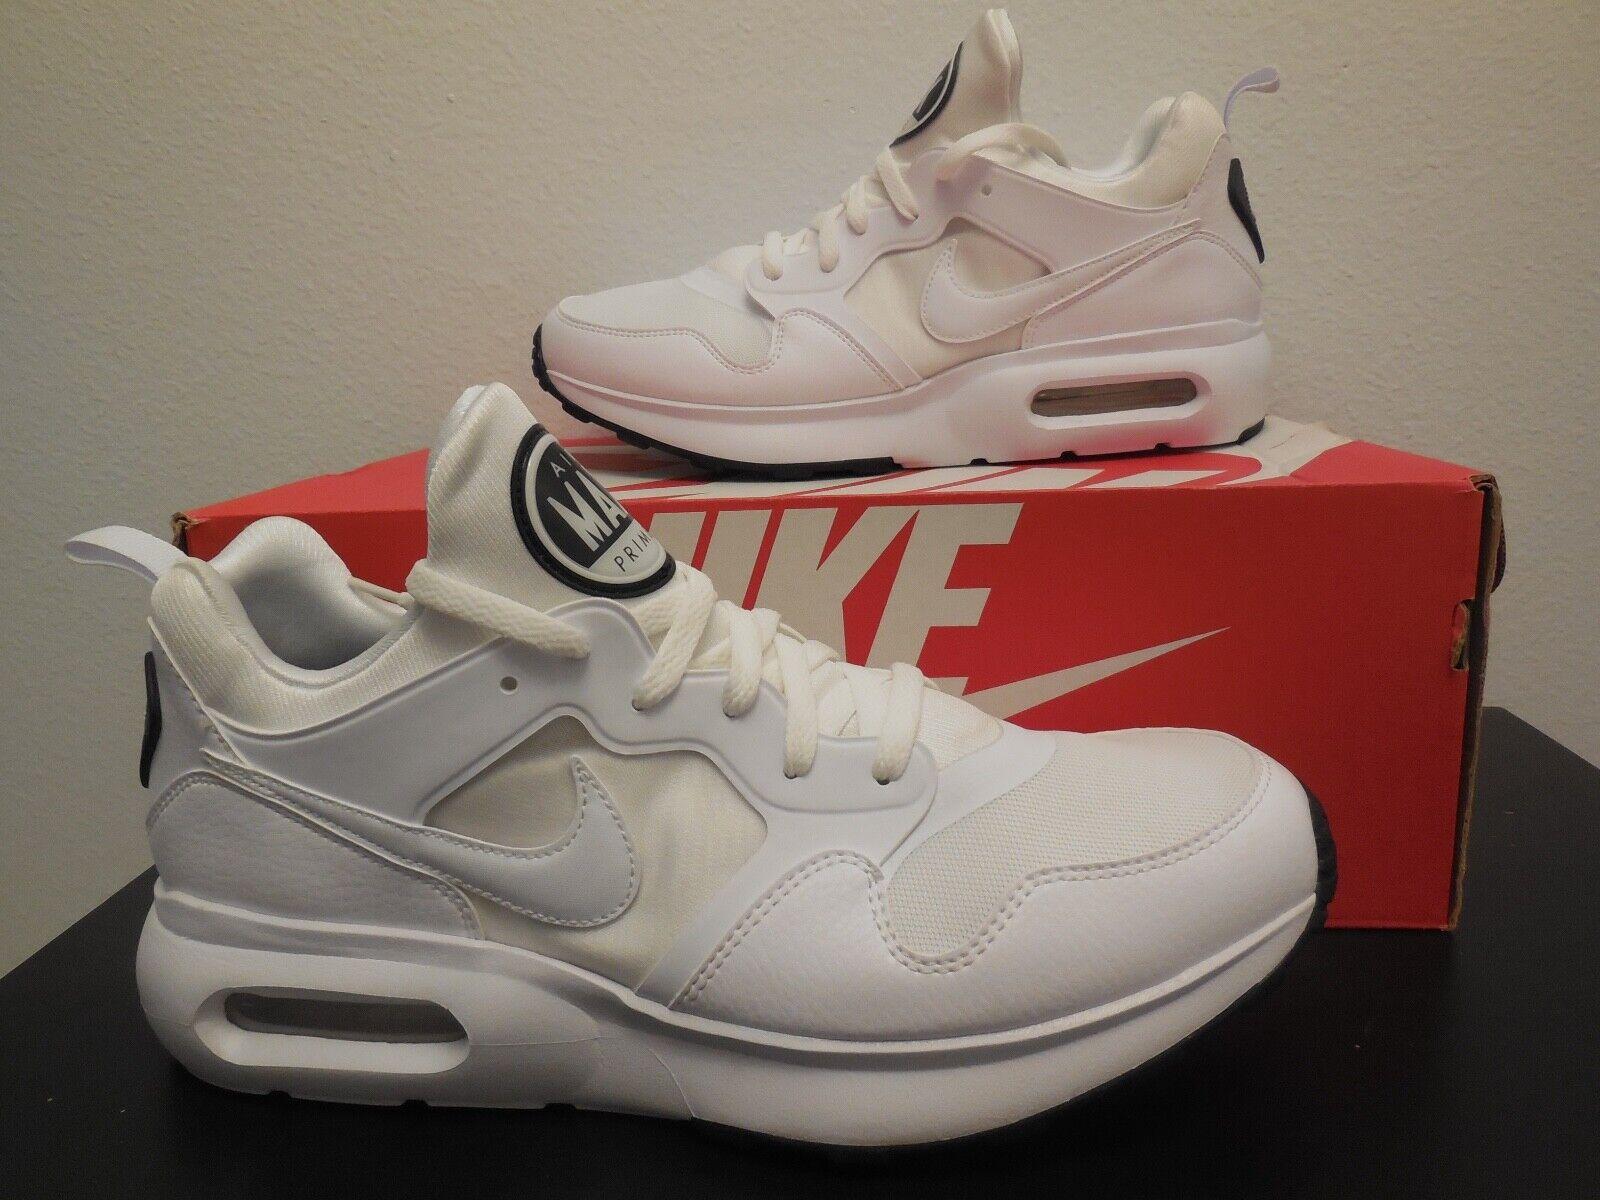 Men's Nike Air Max Prime shoes -Reg  110 -StyleSz 11.5 -NEW